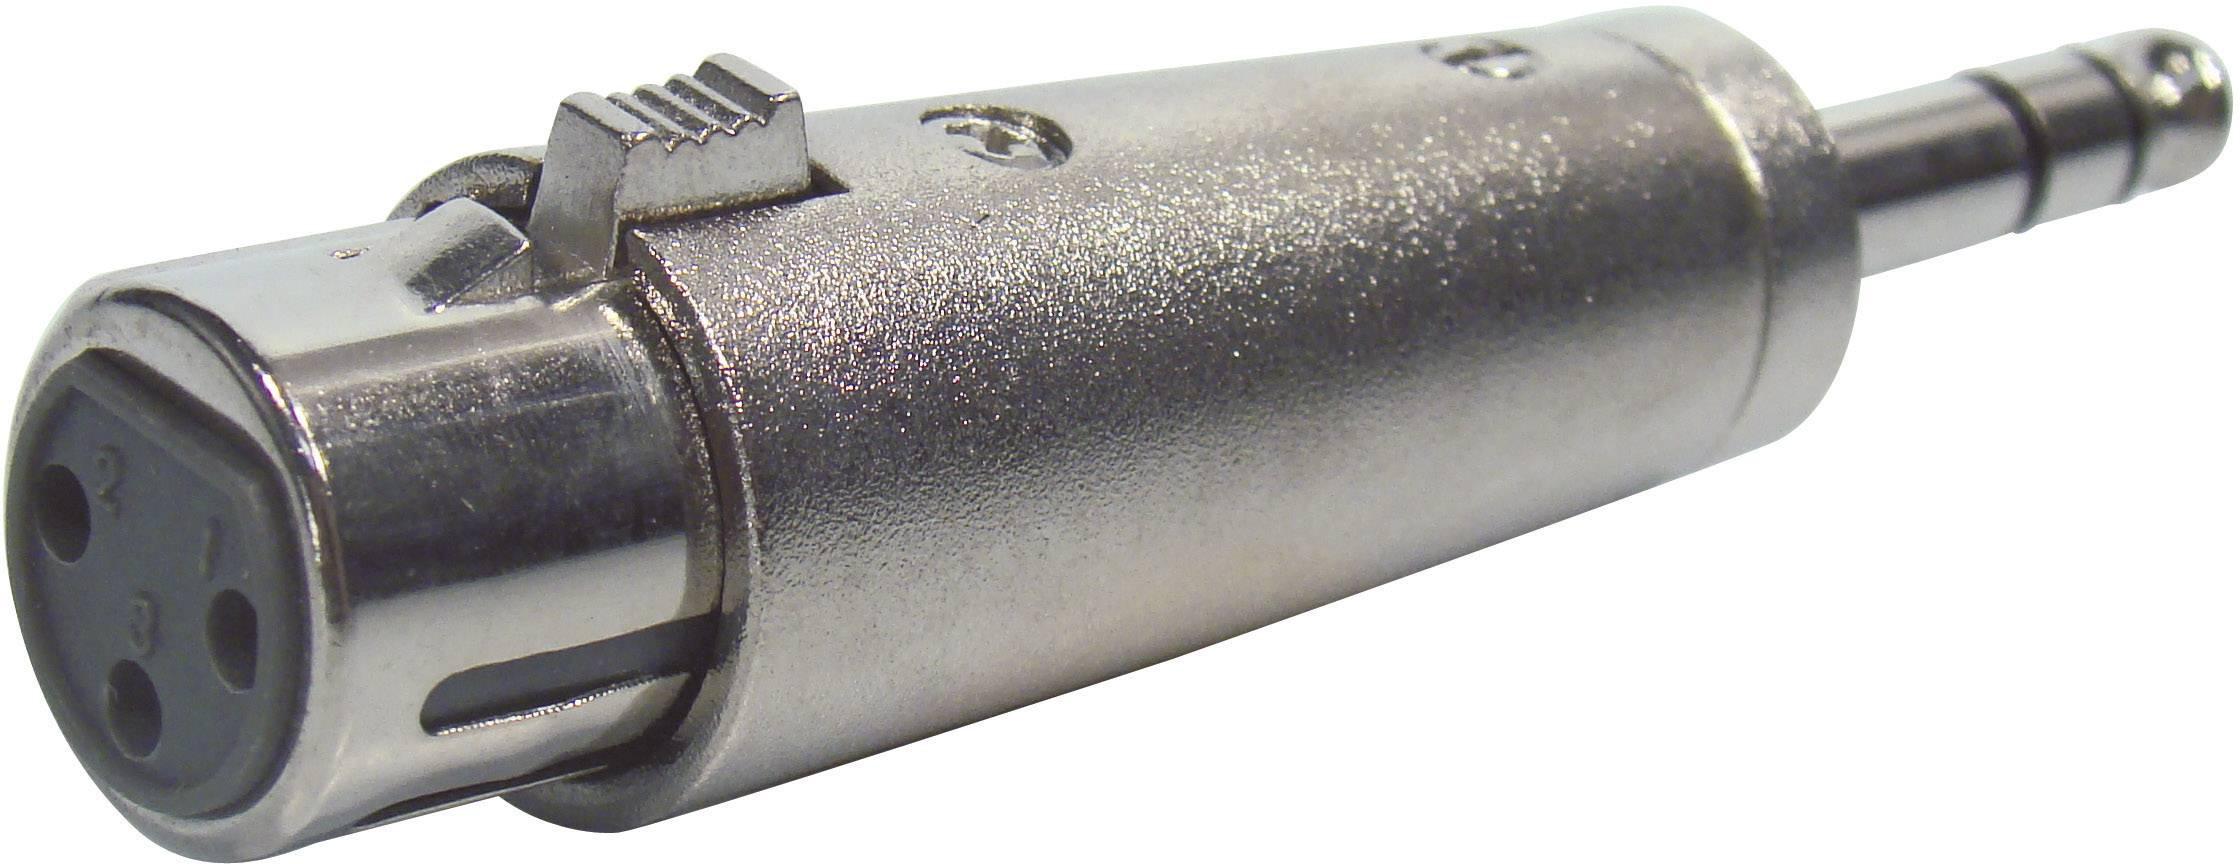 Adaptér Paccs HFA0147 [1x jack zástrčka 6,3 mm - 1x XLR zásuvka], stříbrná